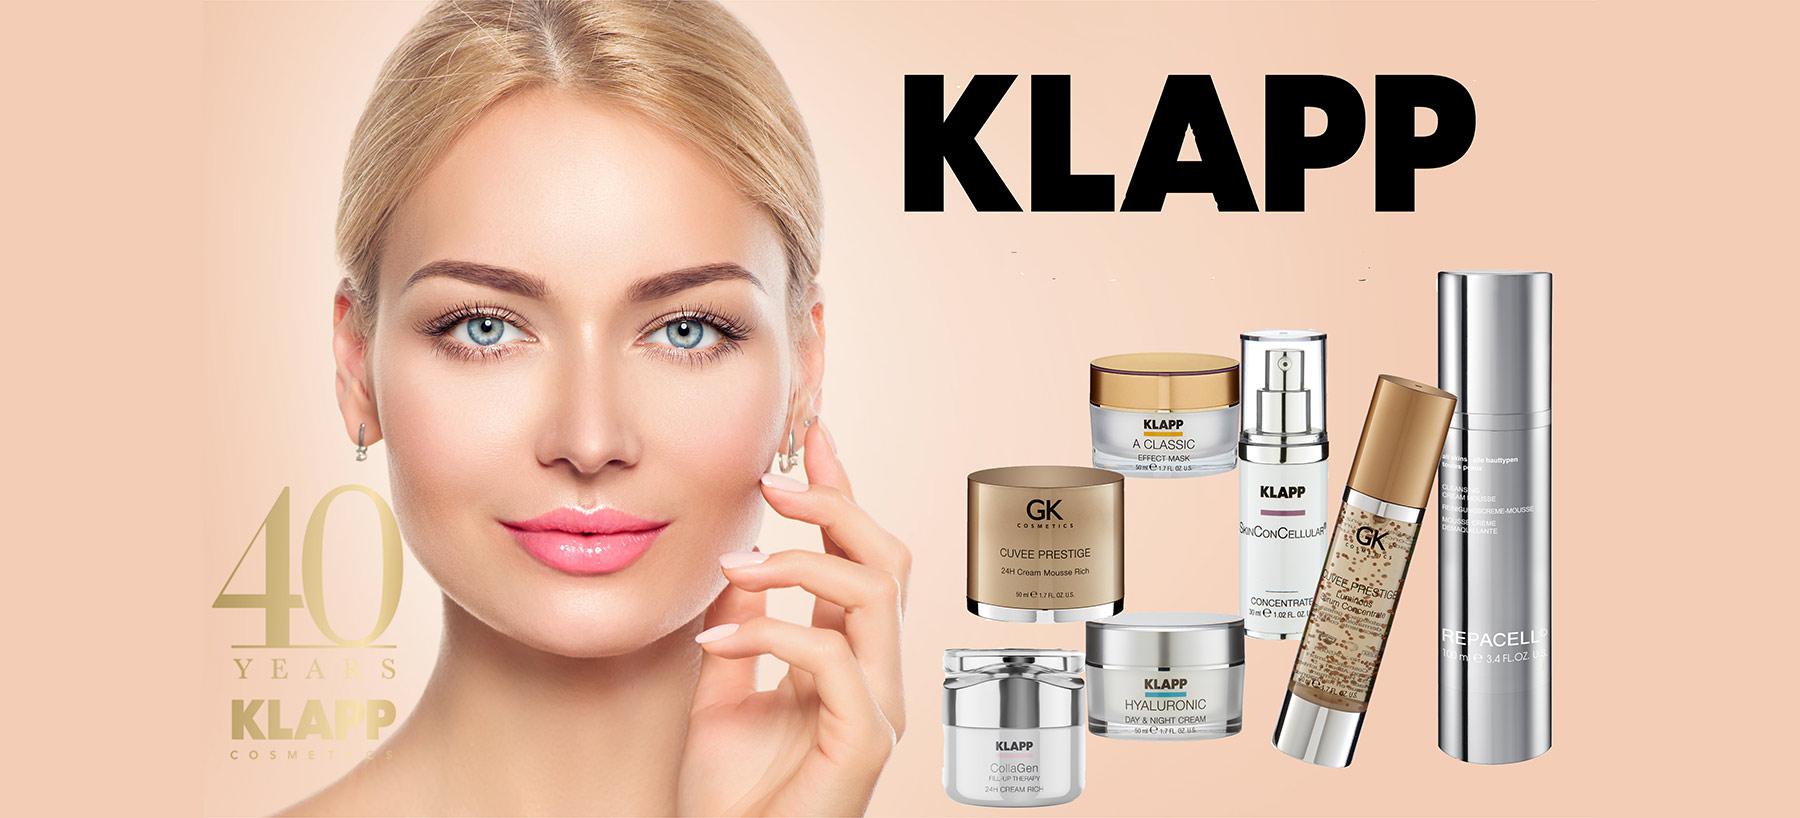 Klapp Beauty Cosmetics Care Pflege bei shop.hautbar.de